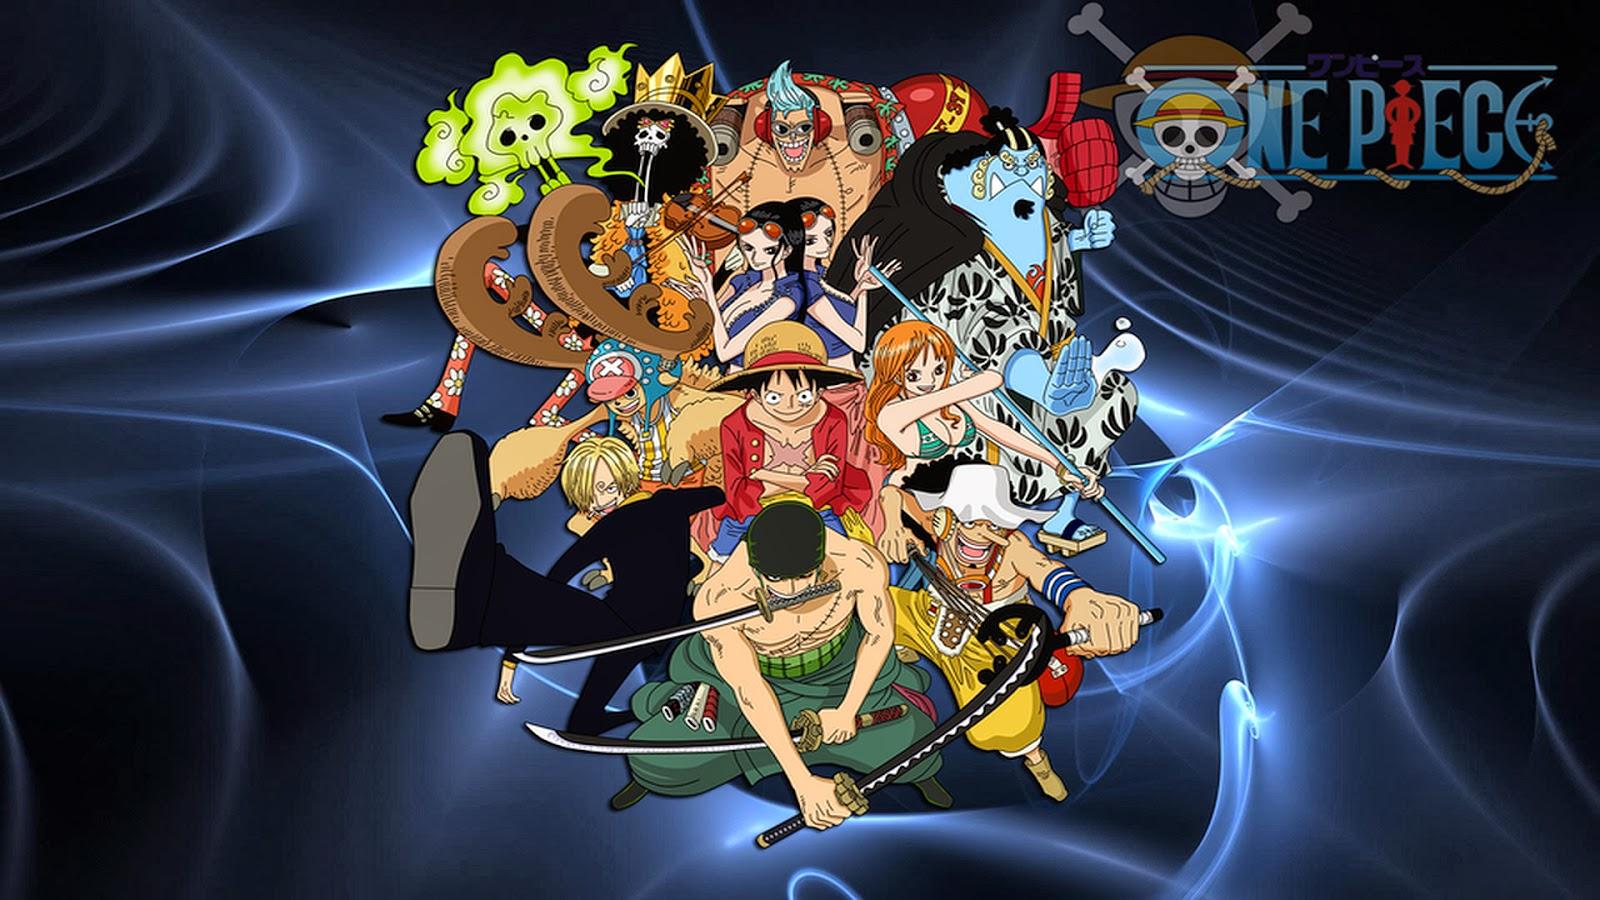 Free Download One Piece Episode 31 One Piece Episode 32